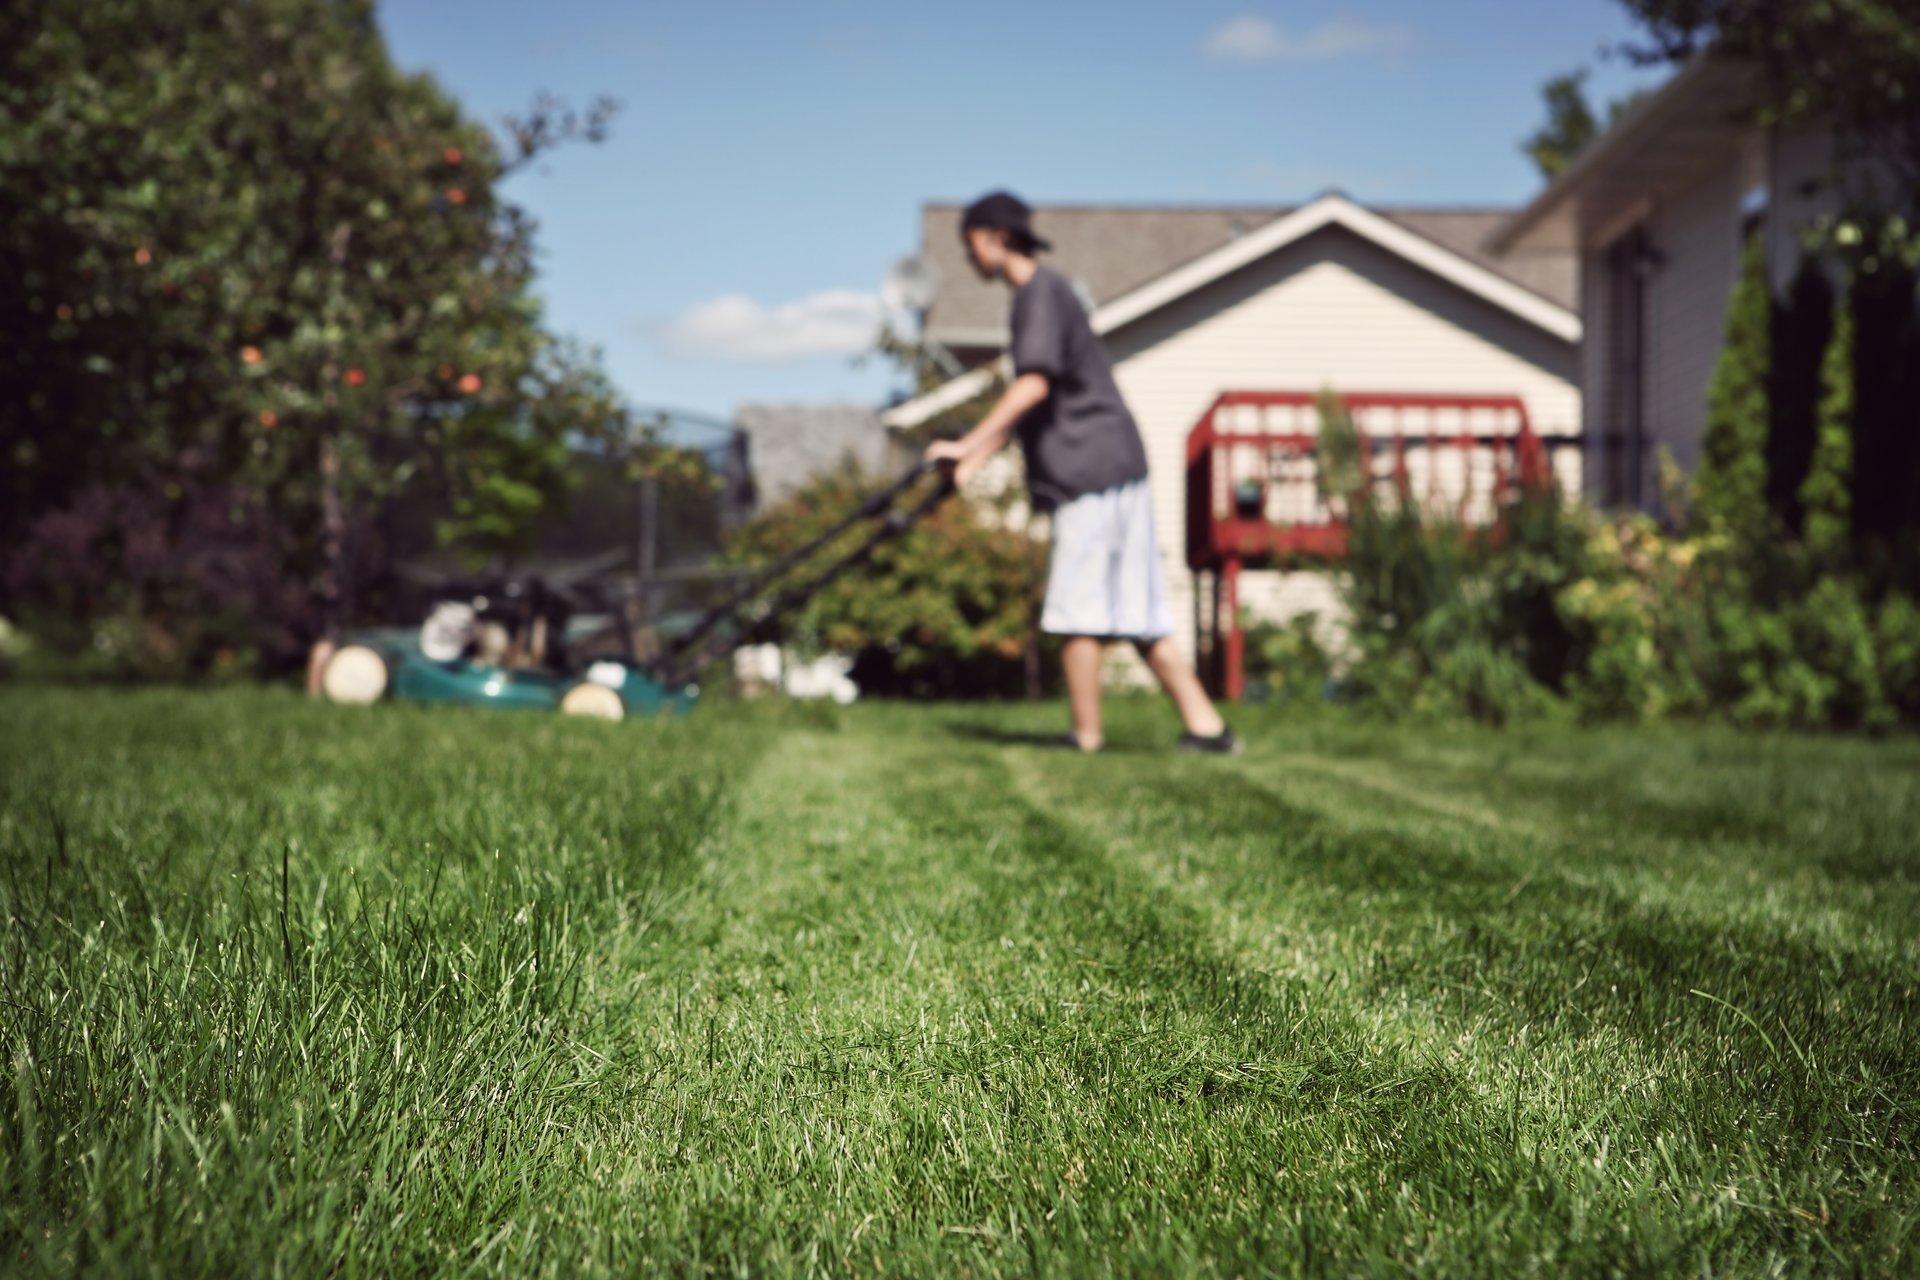 Teenage boy mowing lawn.